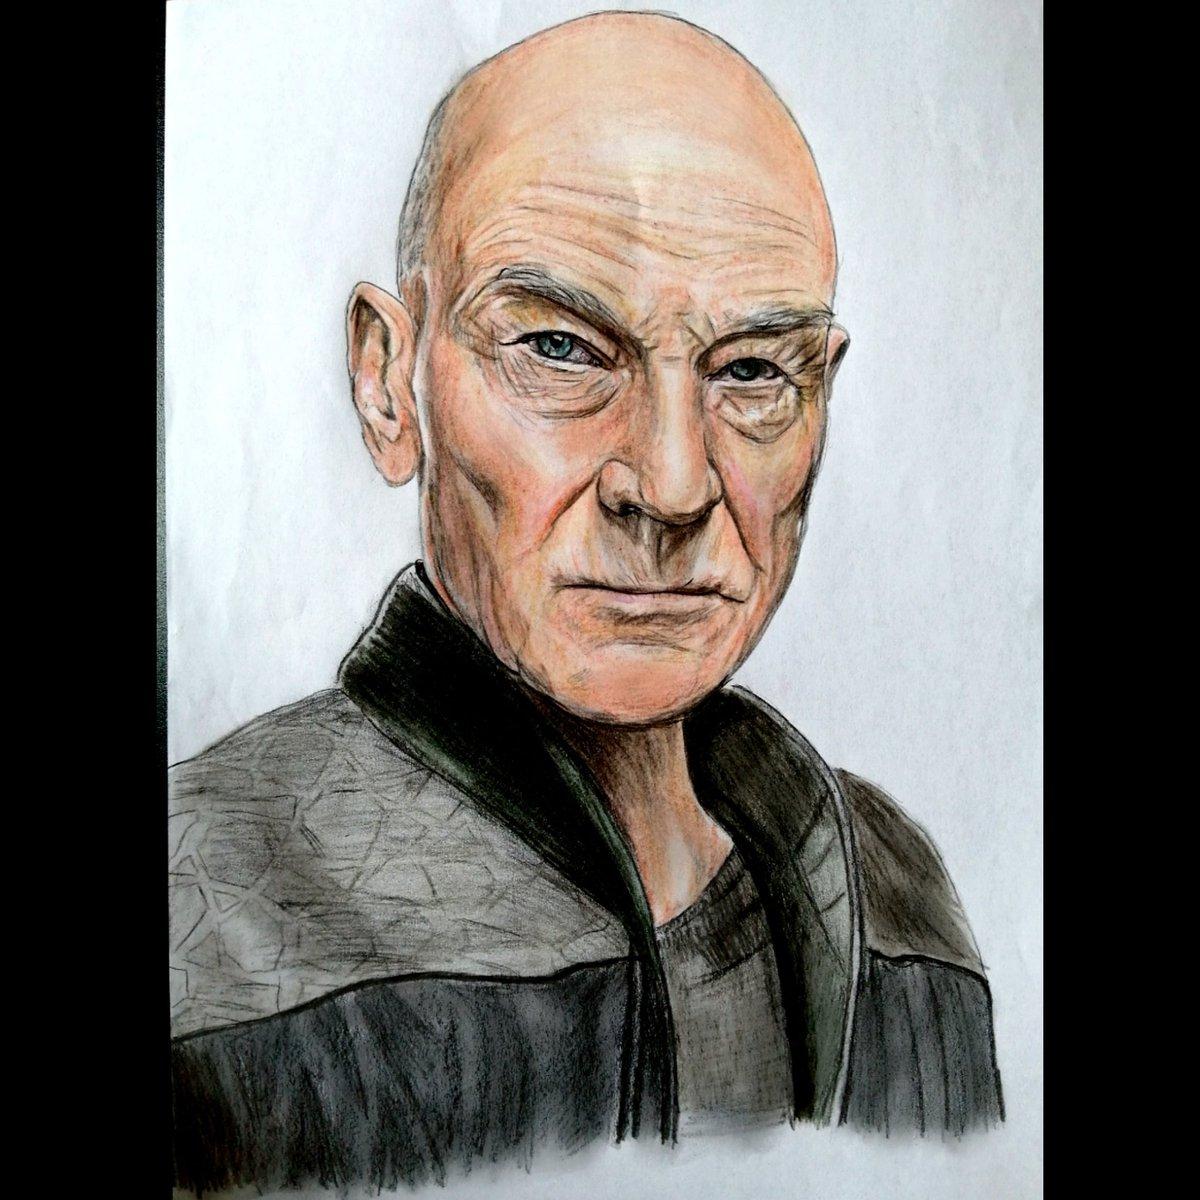 Happy 80th Birthday to Sir Patrick Stewart. This is a drawing I did of him as Picard. @SirPatStew #patrickstewart #startrekthenextgeneration #StarTrekPicard #startrek #art #drawing #TheXMen @BrentSpiner @Marina_Sirtis @jonathansfrakes @levarburton @akaWorf @gates_mcfadden https://t.co/nM1eAzXJ7g